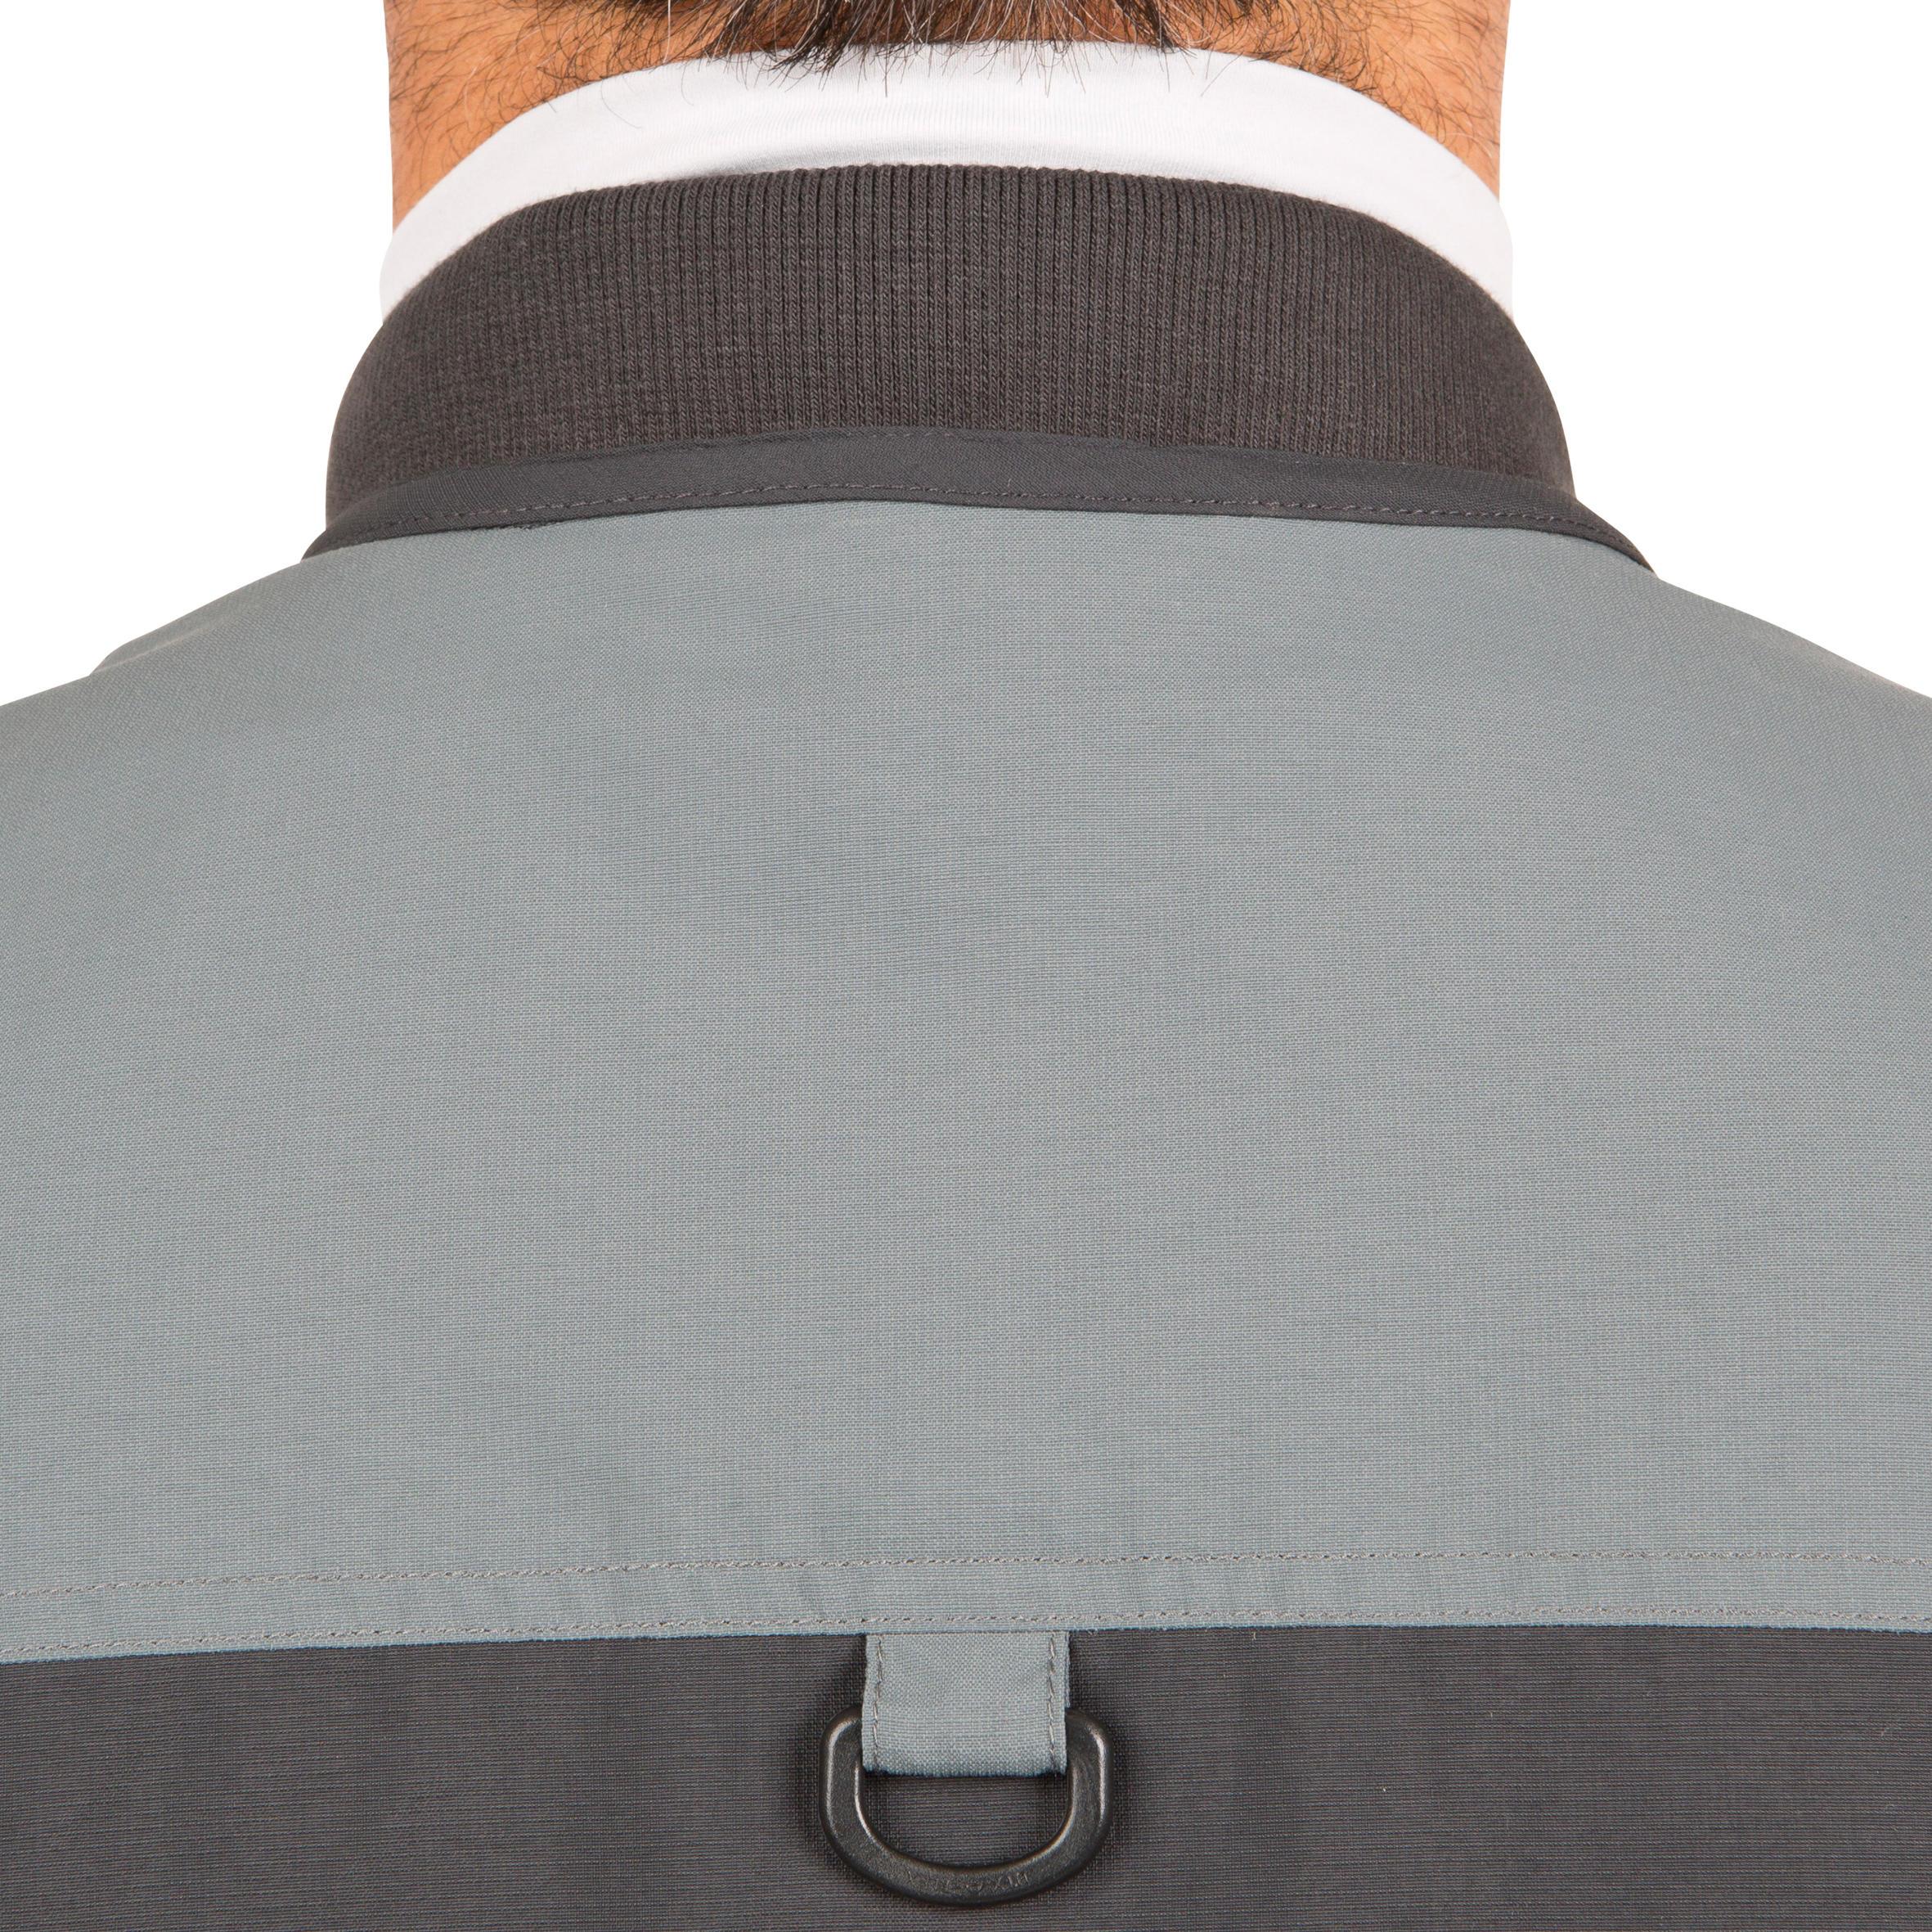 CAPERLAN Fishing gilet 500 - grey